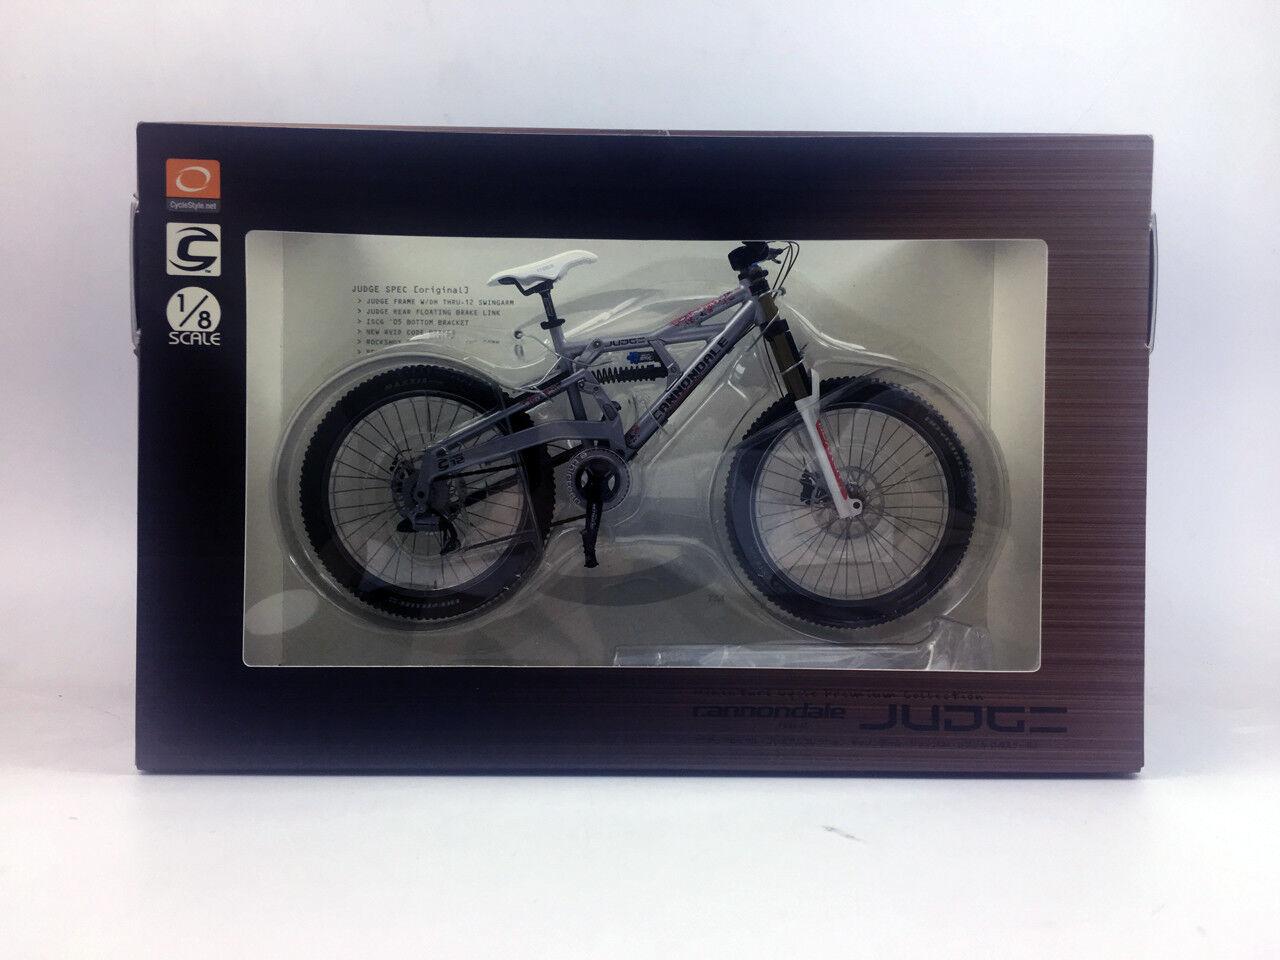 1  8 cannondale judgendh (berg - ausgabe) stück fahrrad - modell